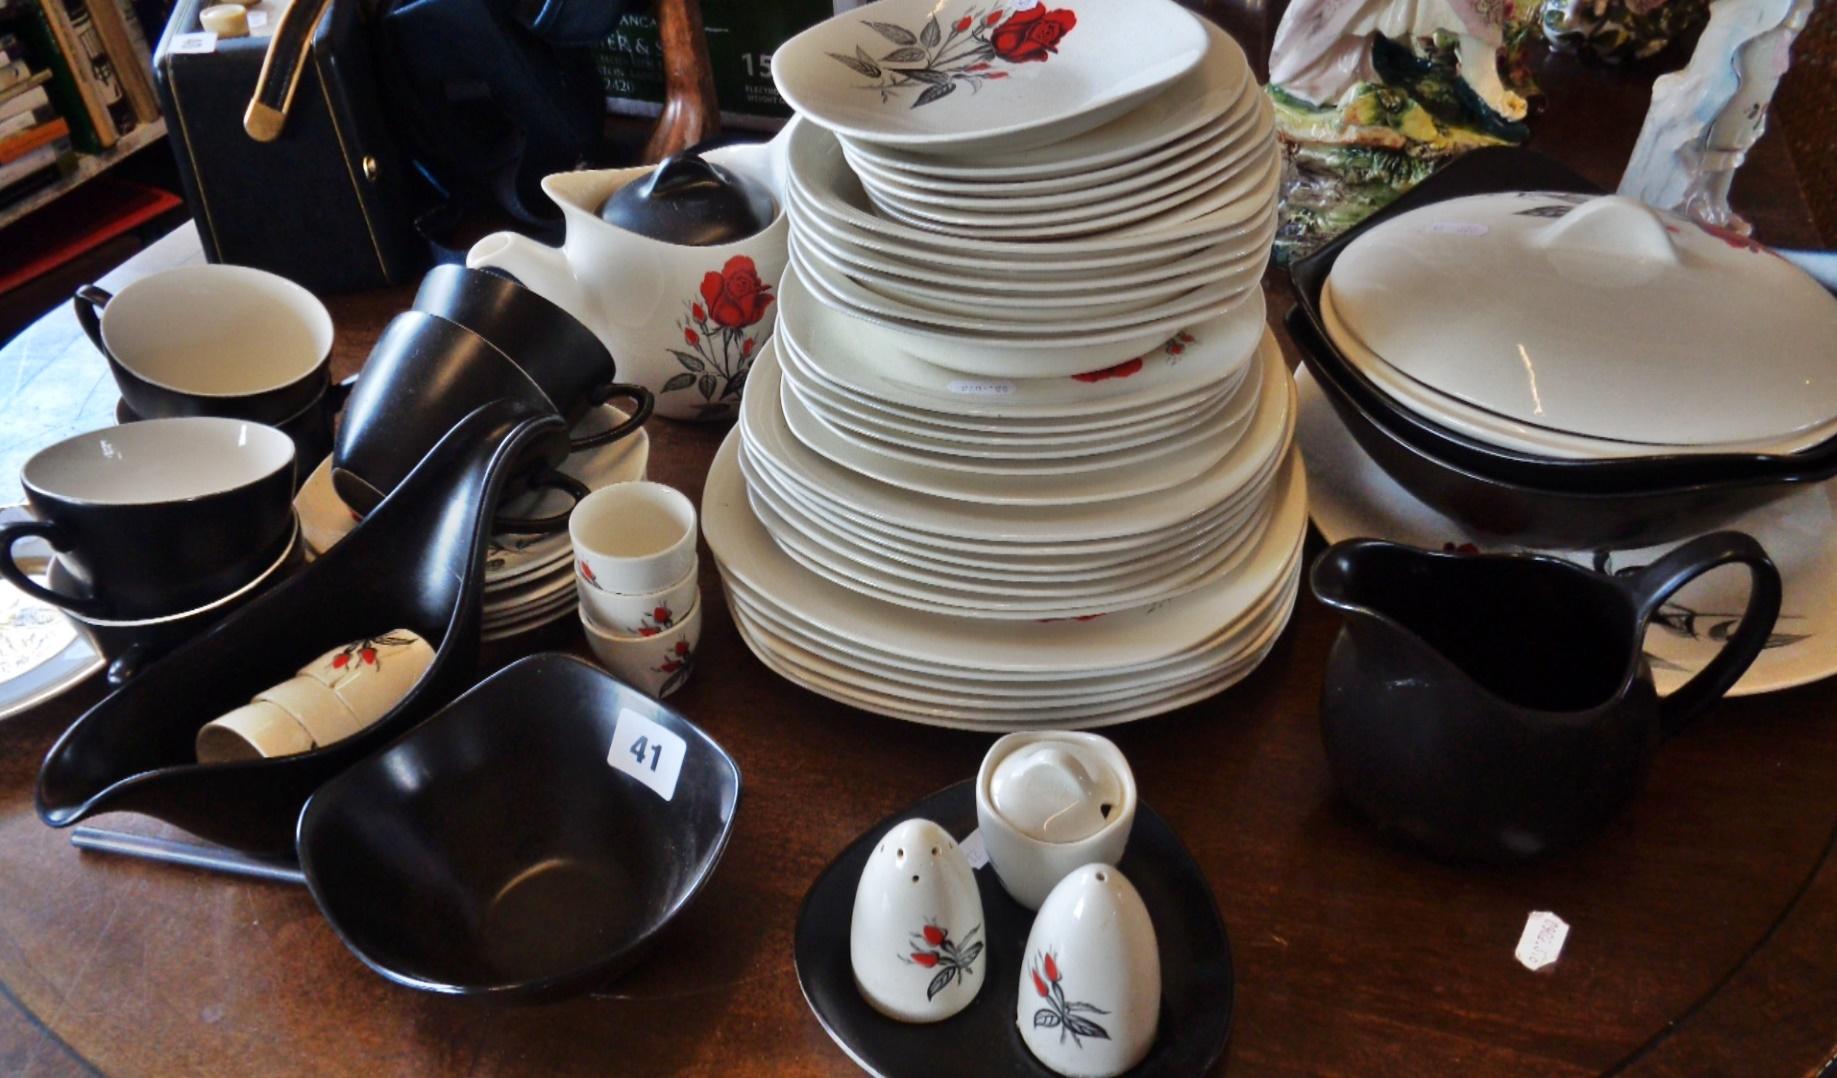 Lot 41 - Midwinter Stylecraft Fashion shape dinner and tea service (57 pieces)